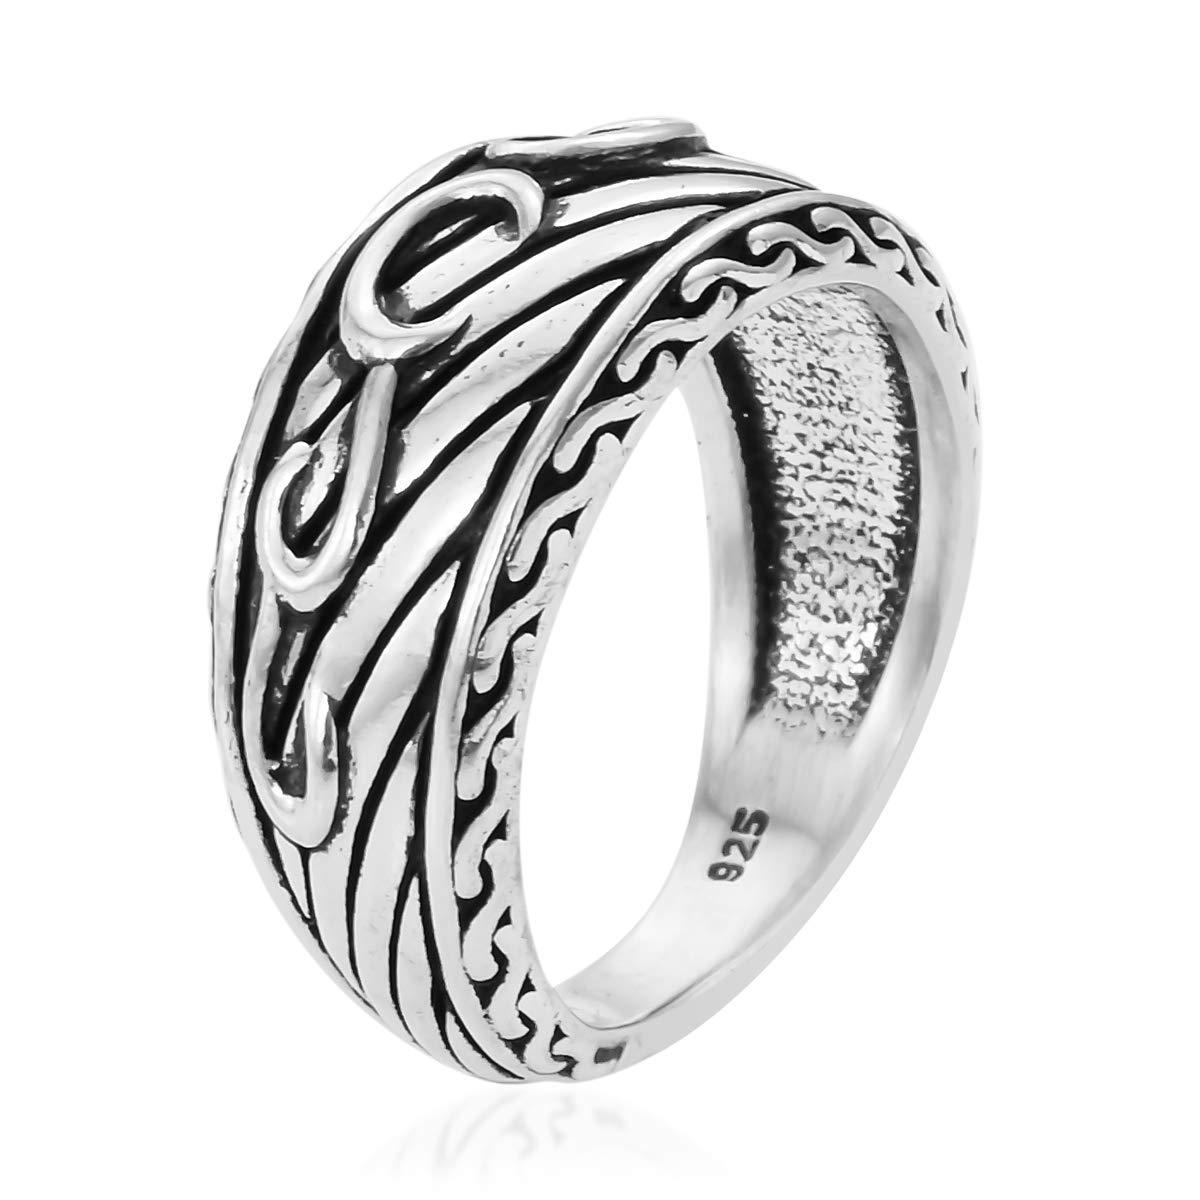 Statement Ring 925 Sterling Silver Boho Handmade Jewelry for Women Avg 5.20 g